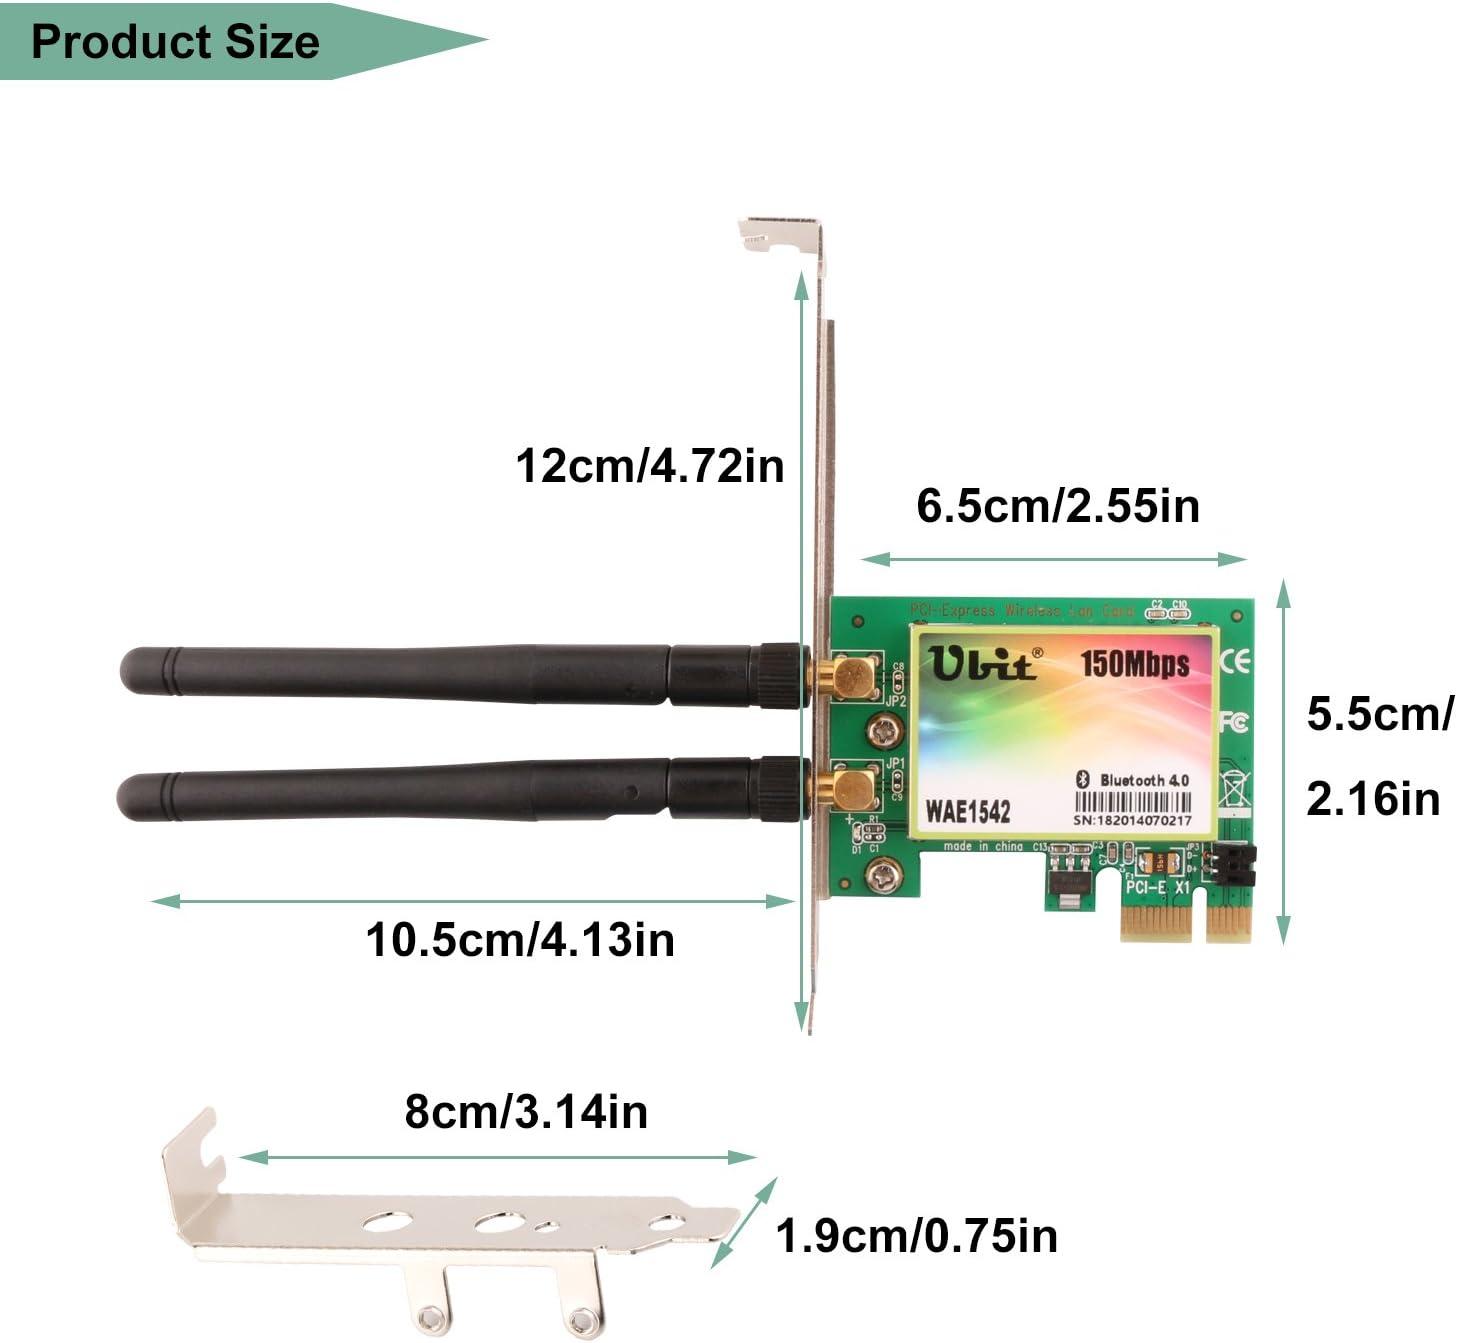 Ubit Wireless PCIe-Netzwerkkarte PCI-E Express mit AP-Launung Netzwerk-Server-Netzwerkadapterkarte f/ür Gaming//Desktop PC 802.11N, 450 Mbit//s, Dual-Band, 2,4 GHz//5 GHz WIE5300 WiFi-Karte